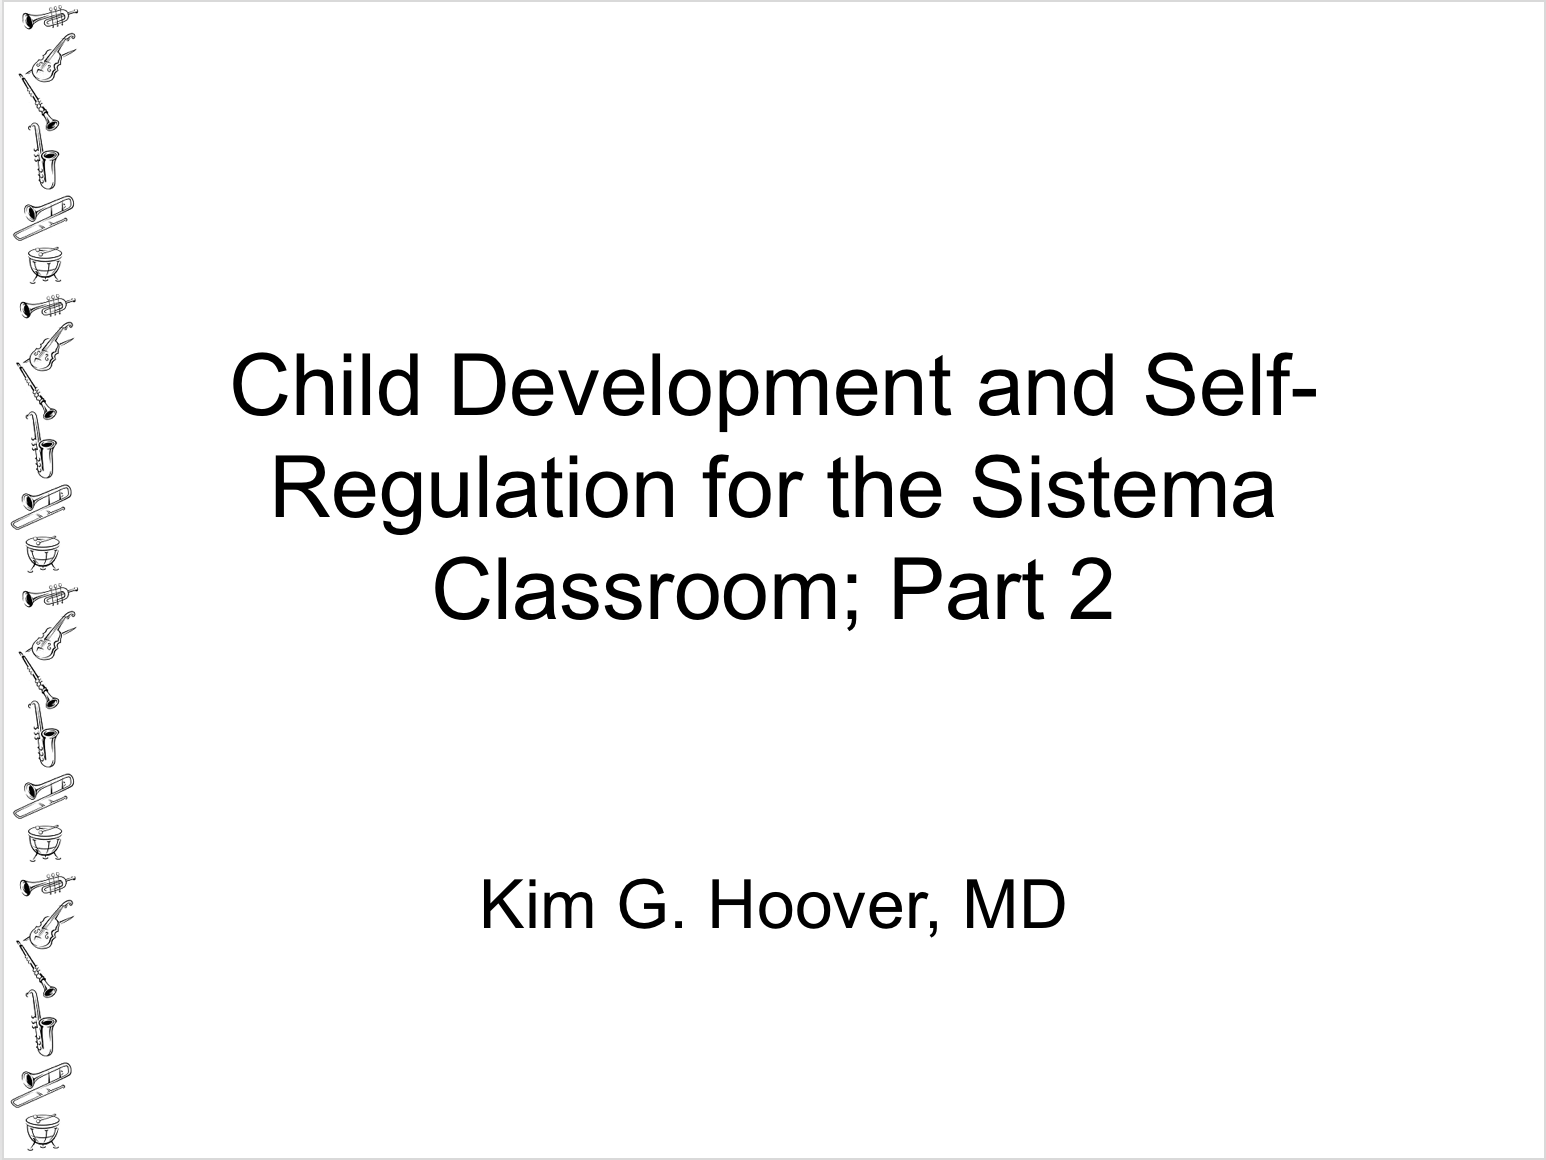 Webinar: Kim Hoover On Child Development And Self Regulation – May 2017